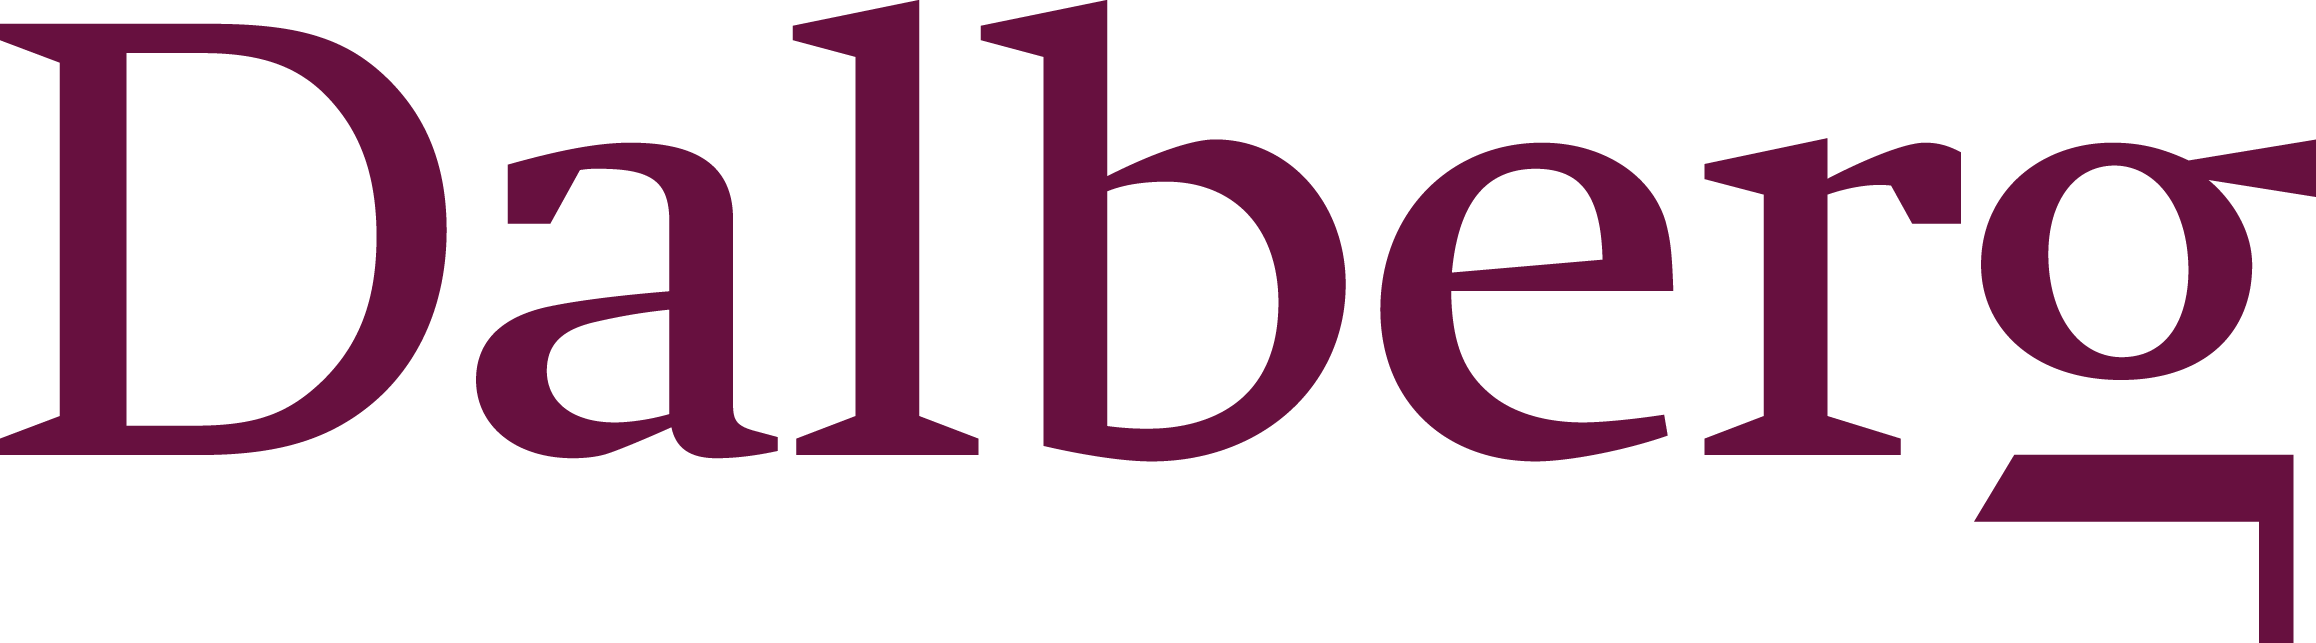 Dalberg-Logo-HiRes-Color.png